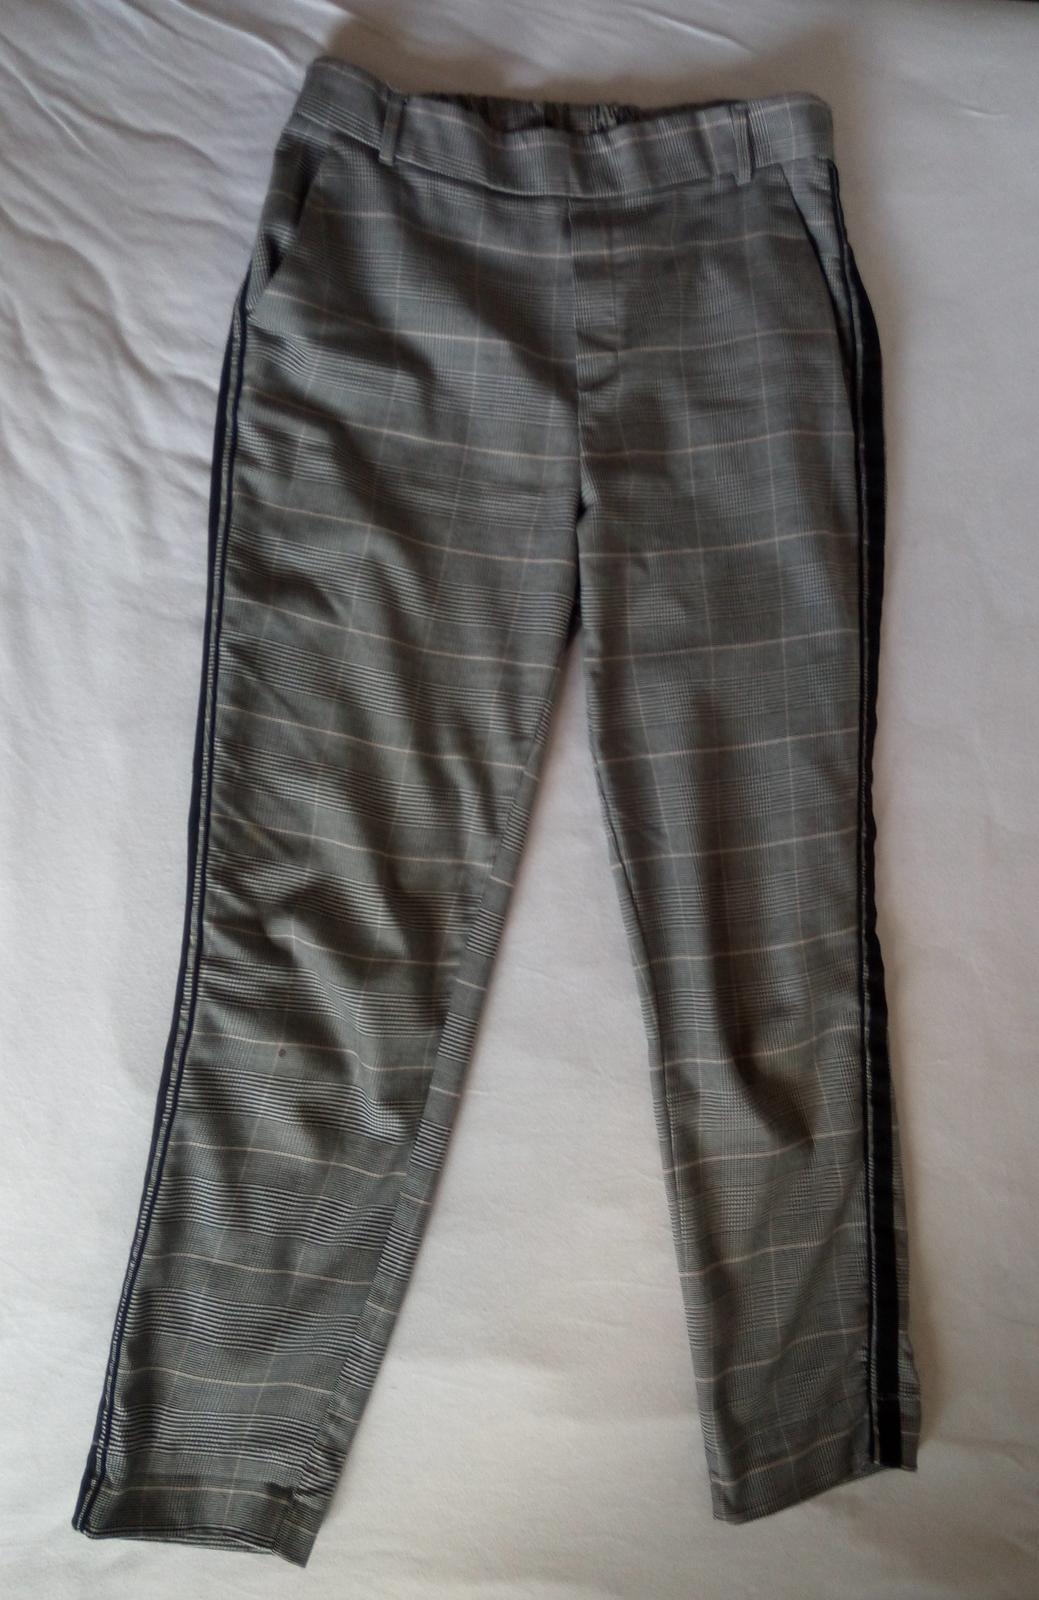 Kárované nohavice S - Obrázok č. 2